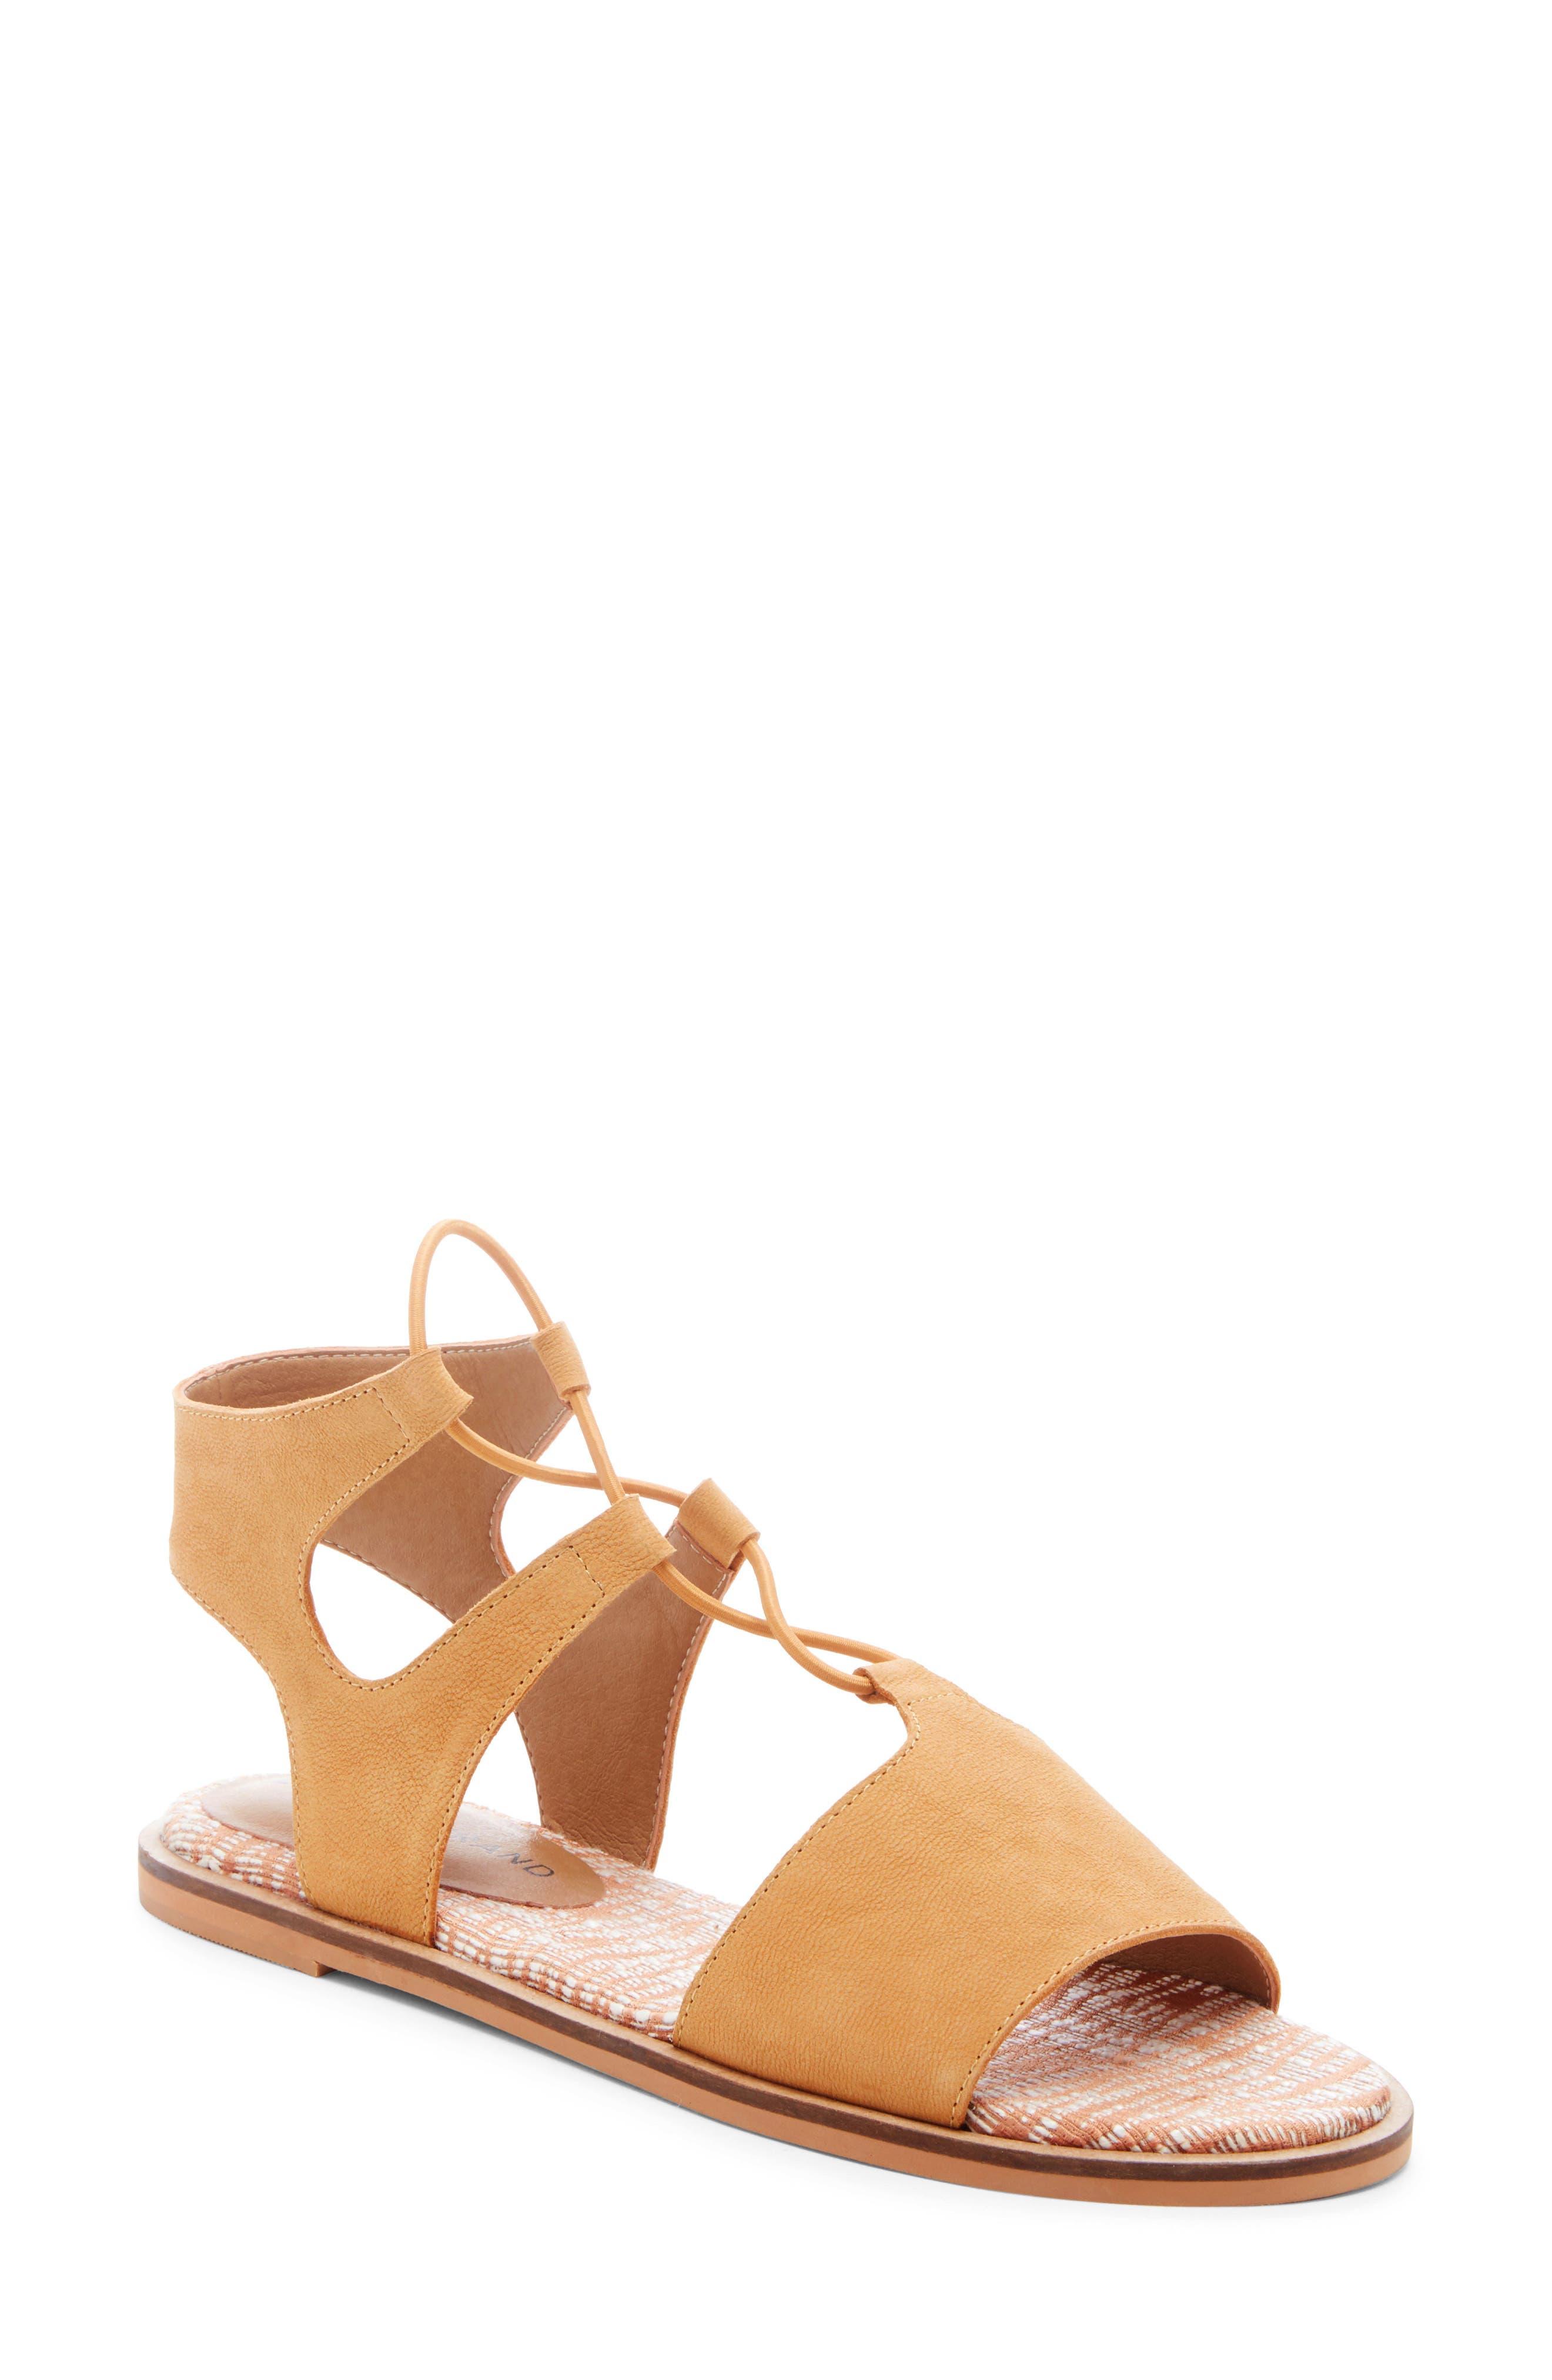 Lucky Brand Feray Gladiator Sandal- Brown